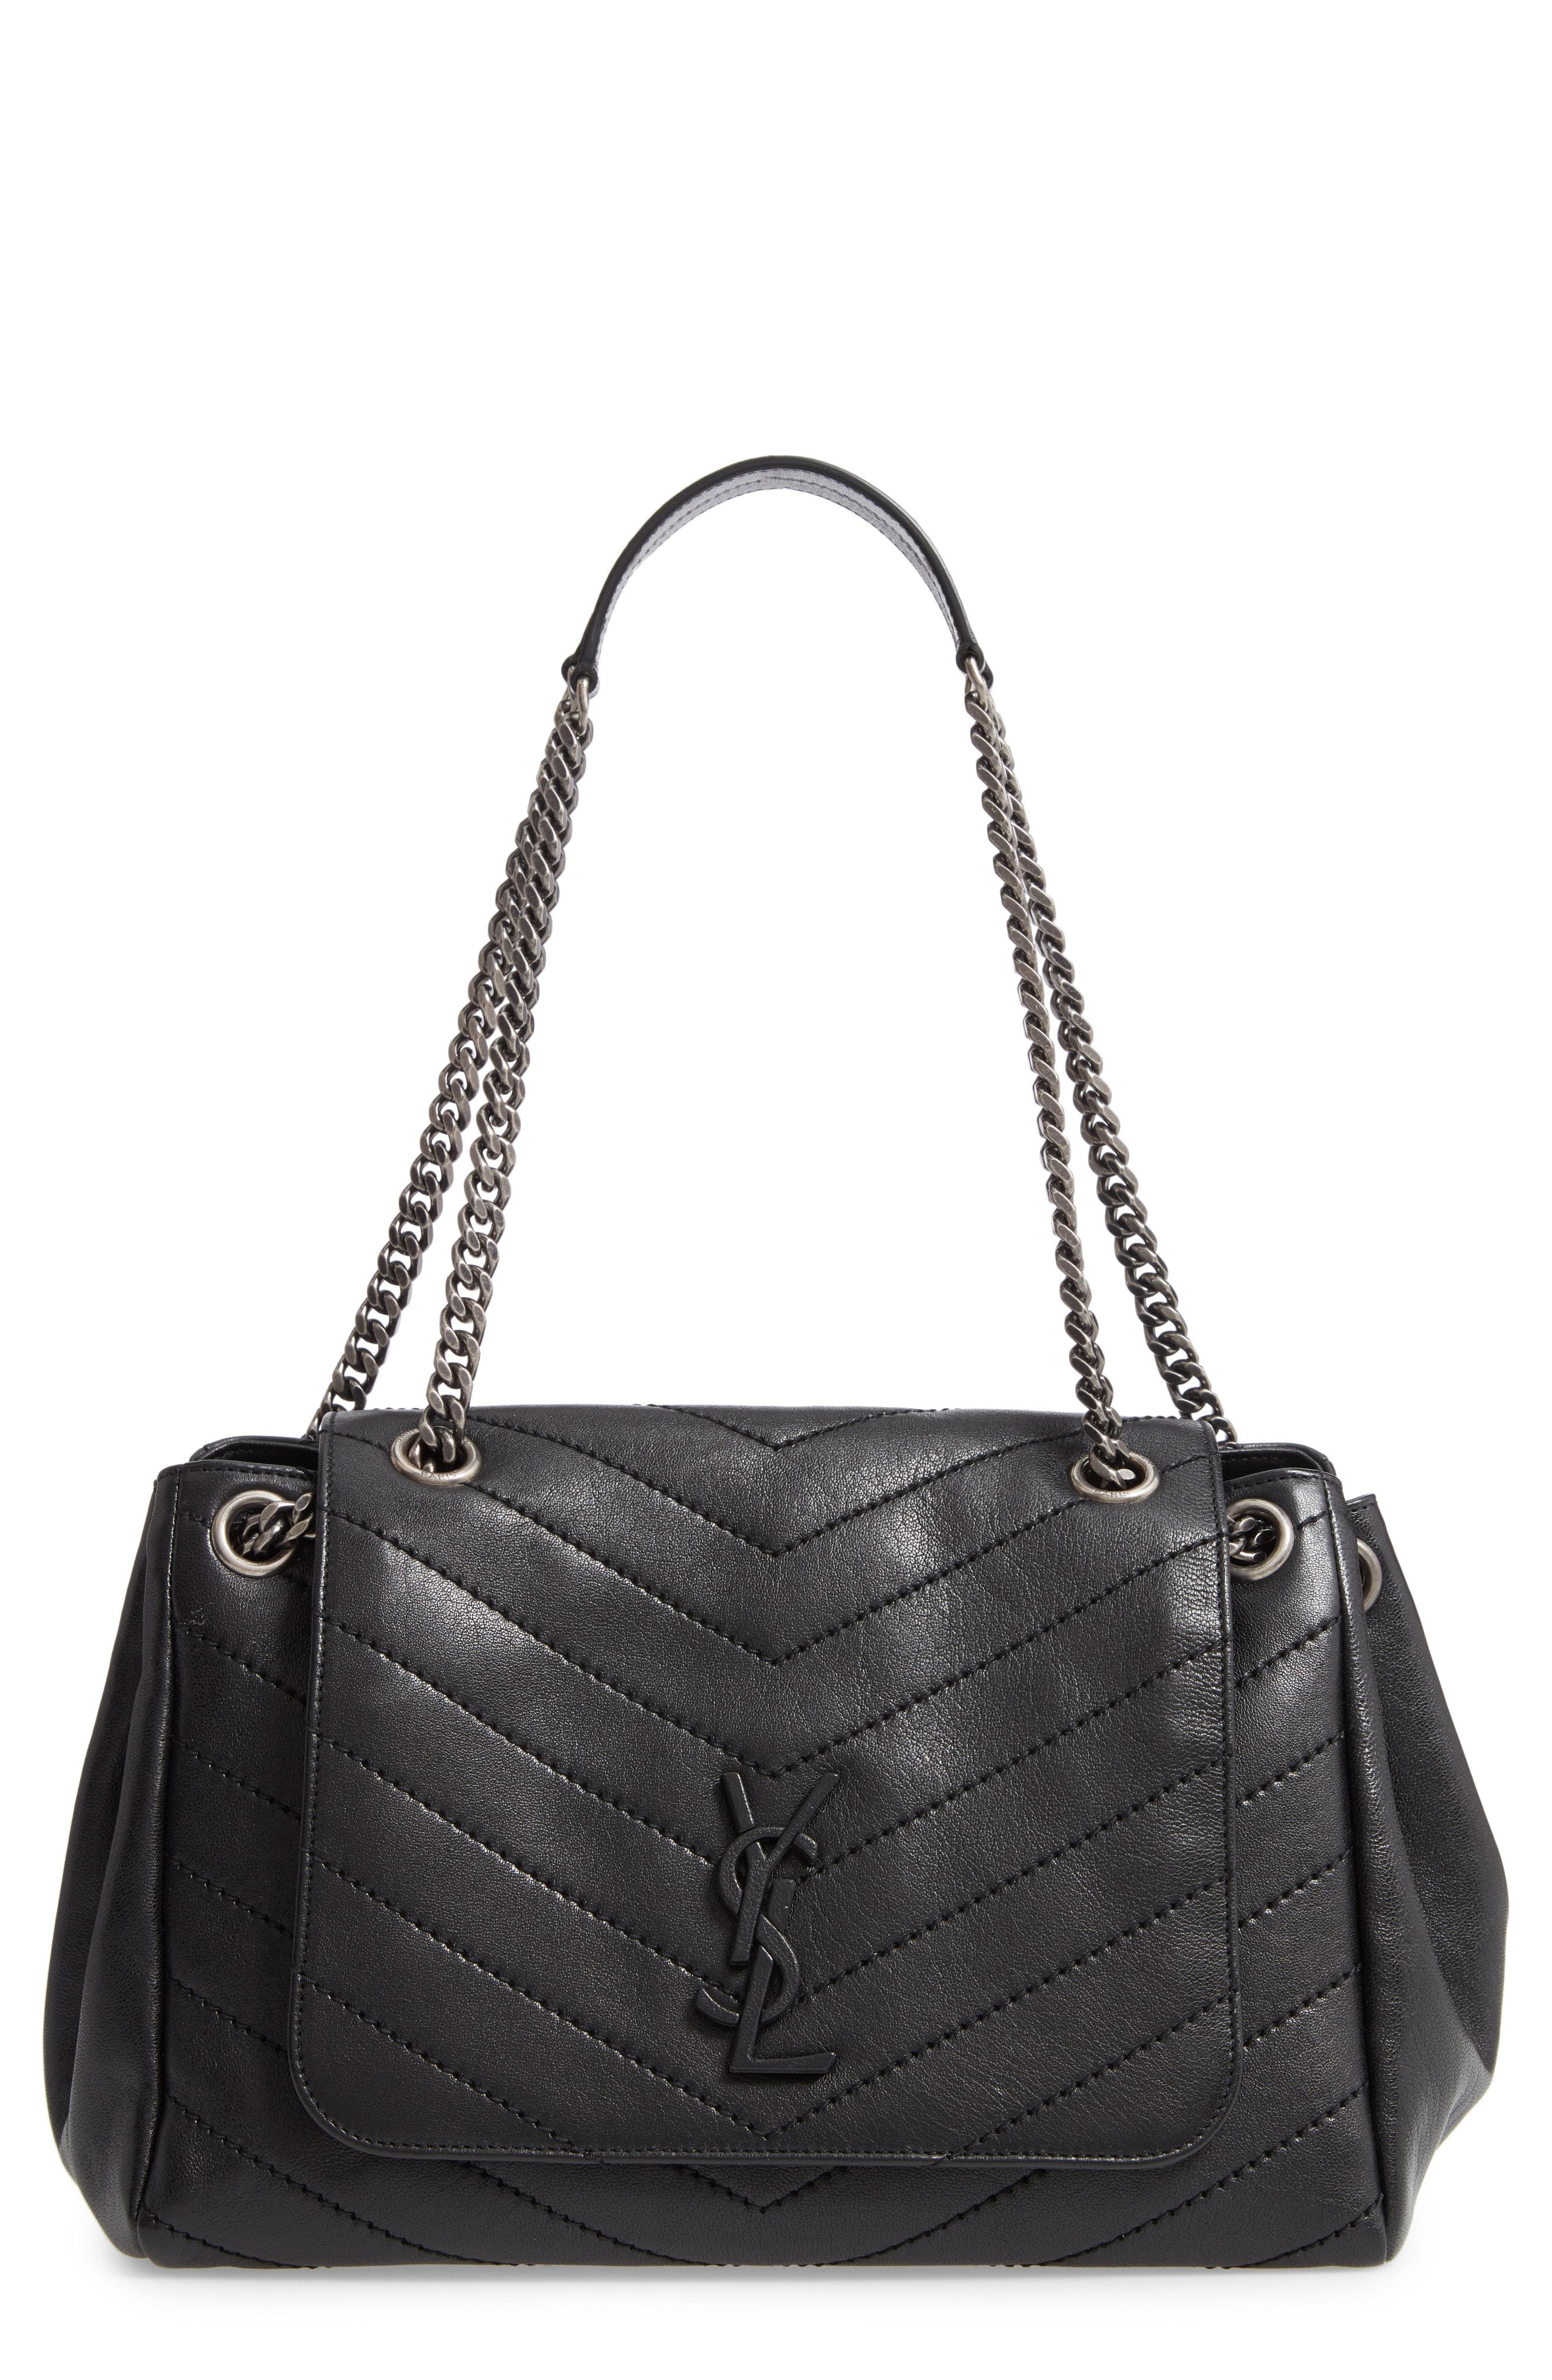 ac79563ec867 Saint Laurent Nolita Large Leather Shoulder Bag in Black - Lyst